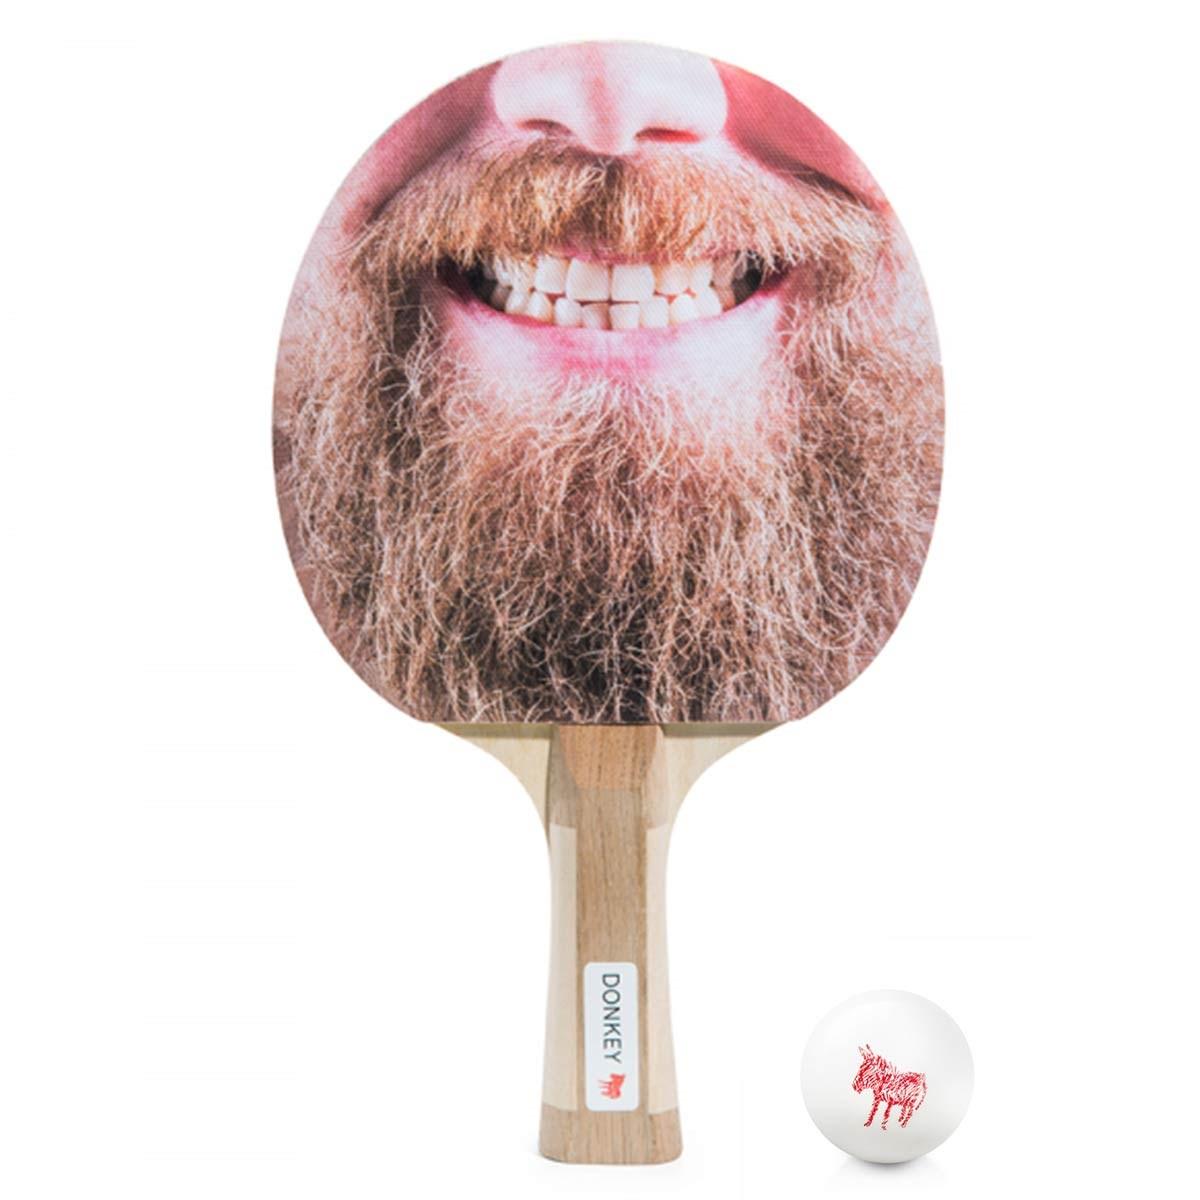 Bearded ping pong bat